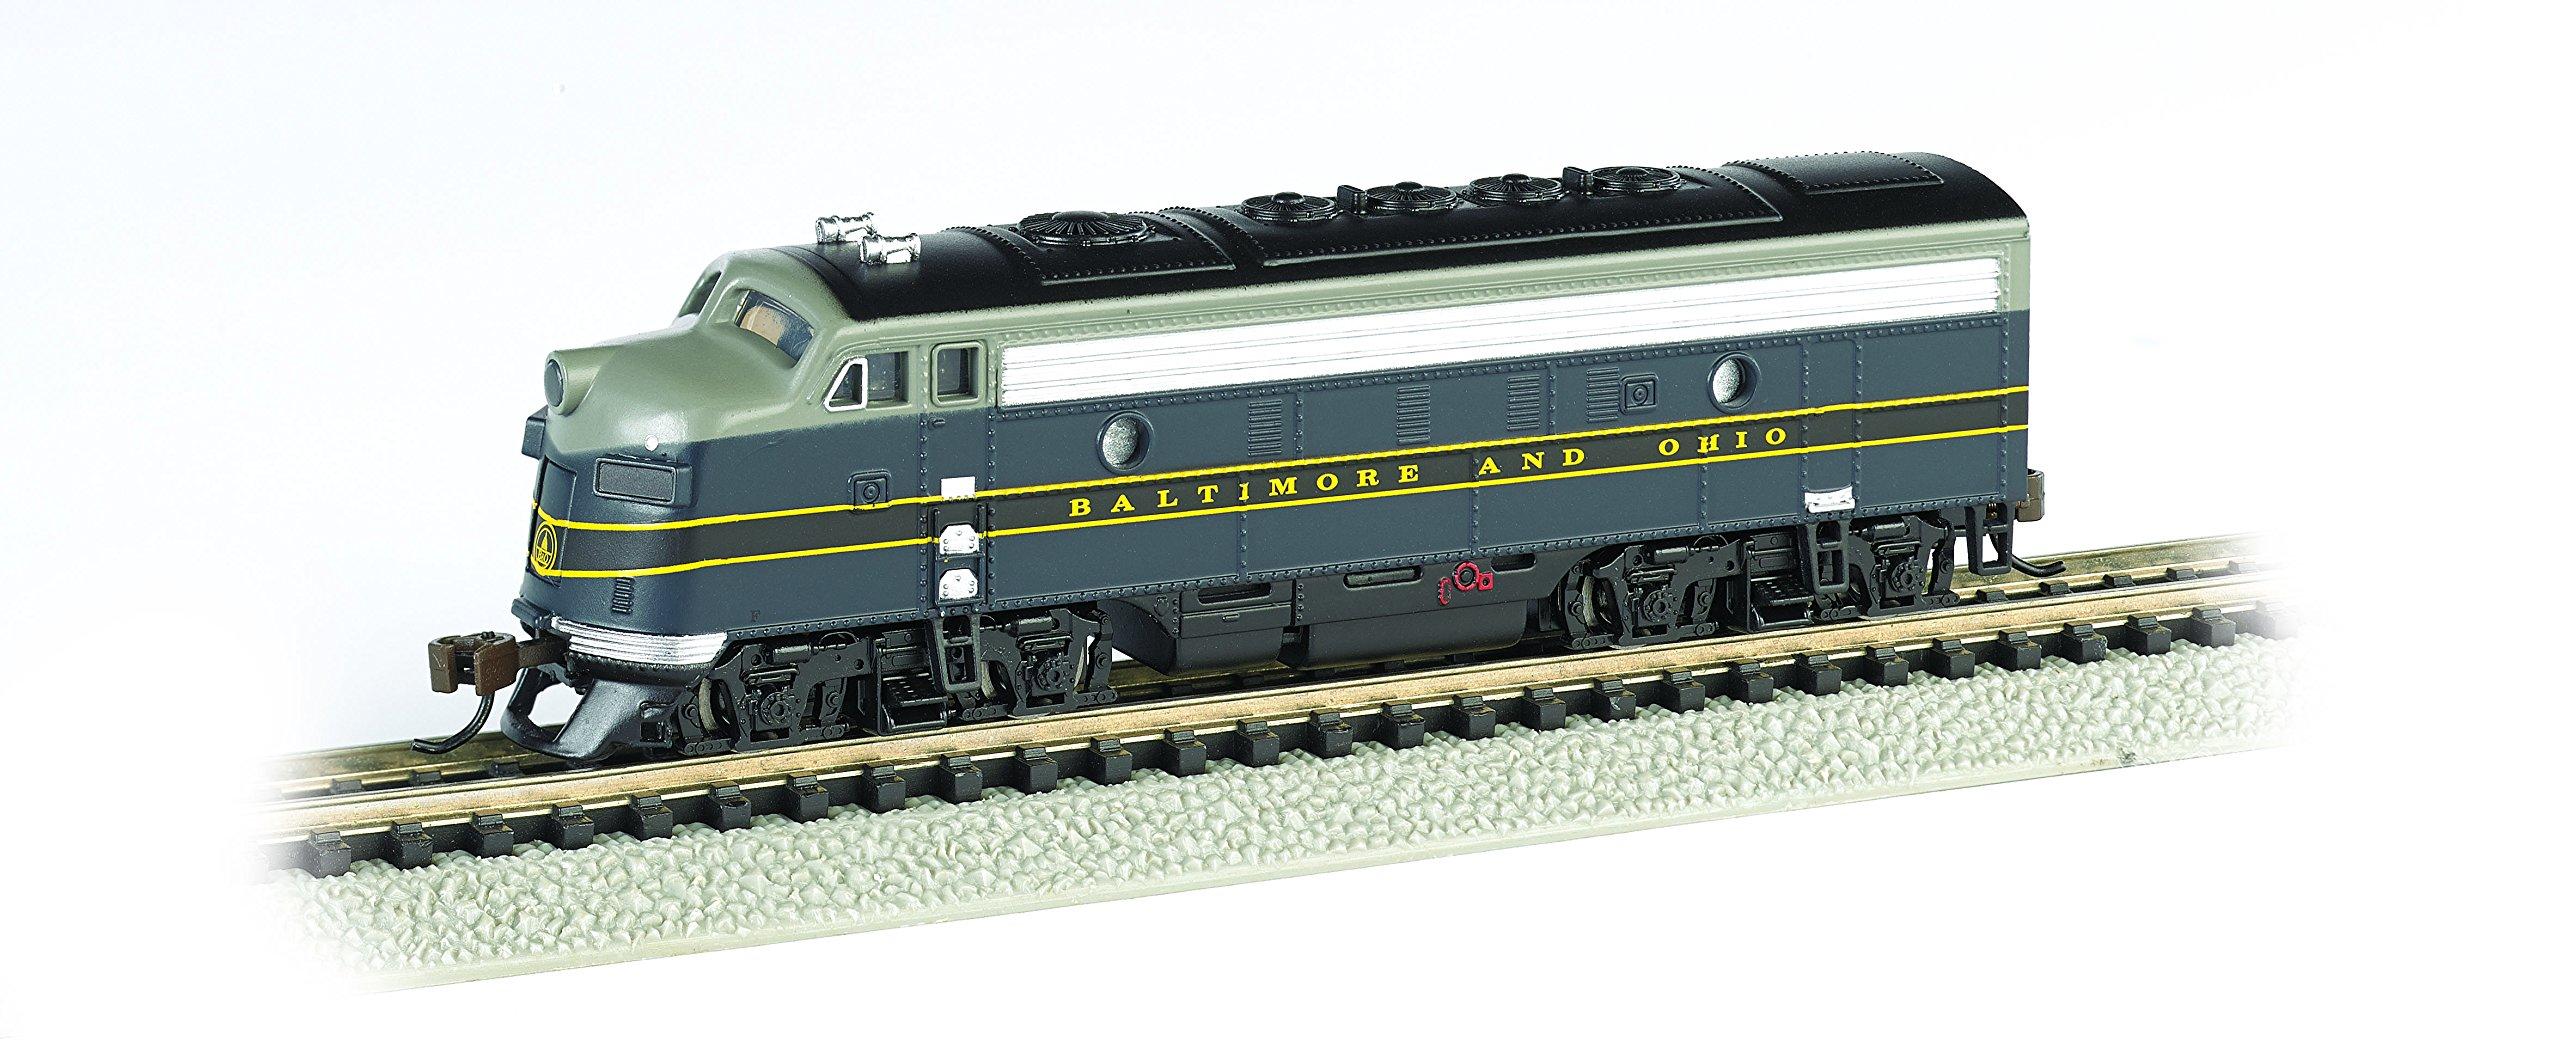 Bachmann Industries EMD F7-A Diesel Locomotive DCC Equipped B and O Train Car, Blue/Gray/Black, N Scale